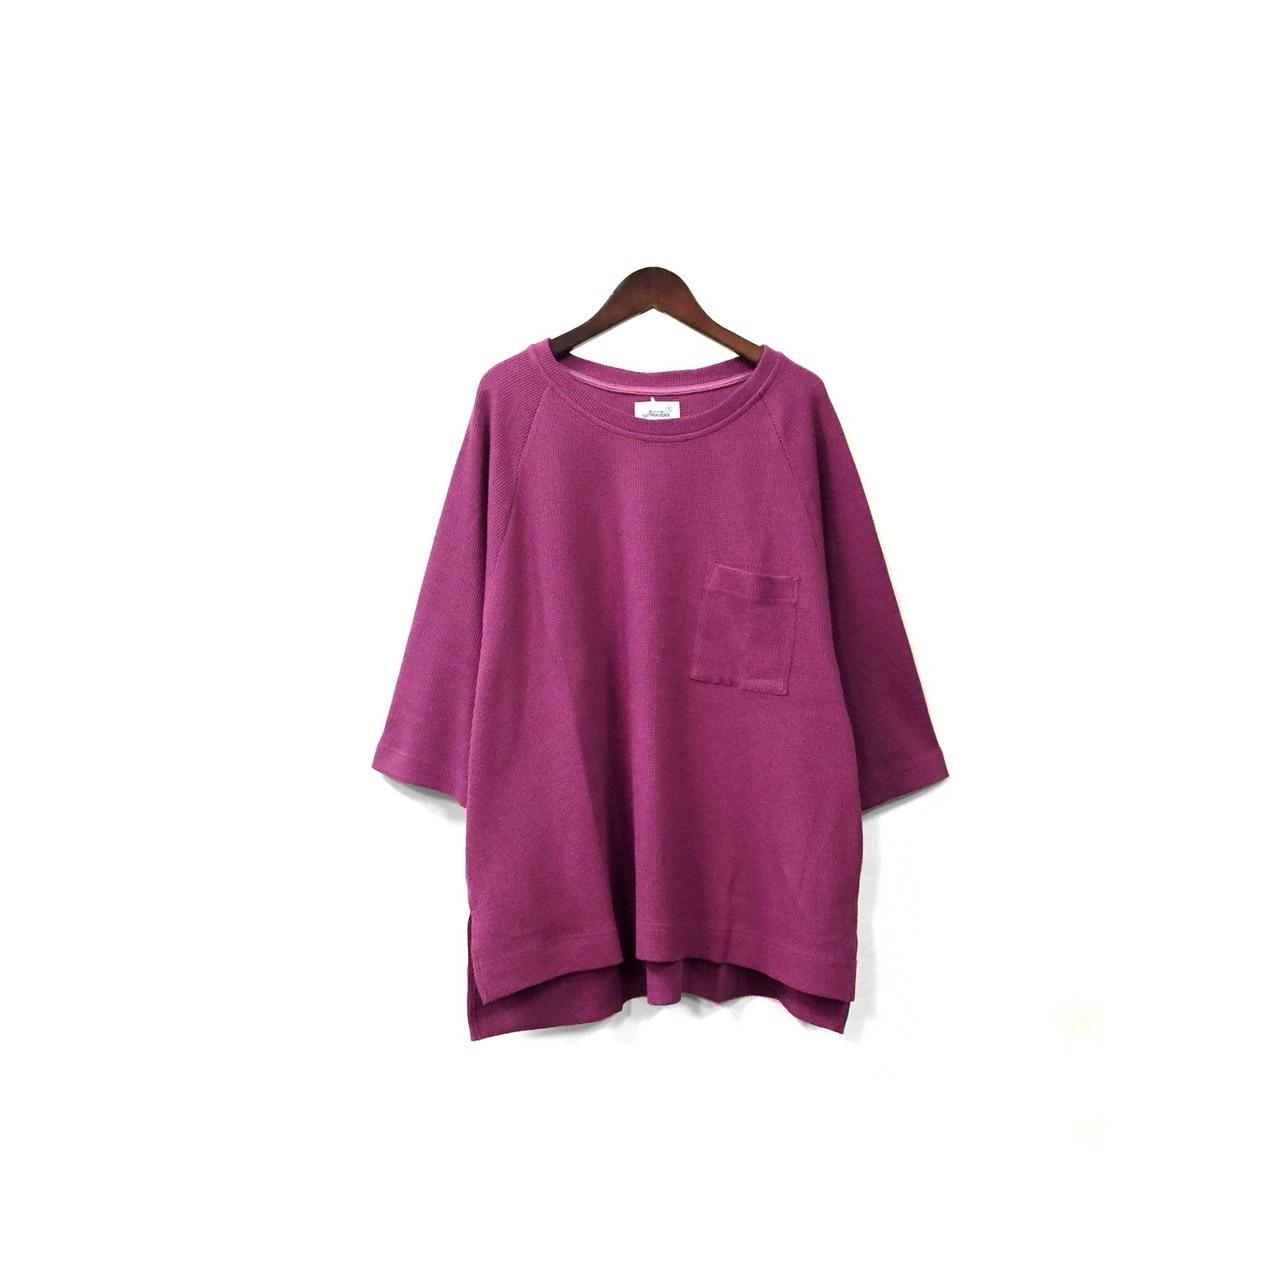 yotsuba - Thermal Tops / Purple ¥11000+tax